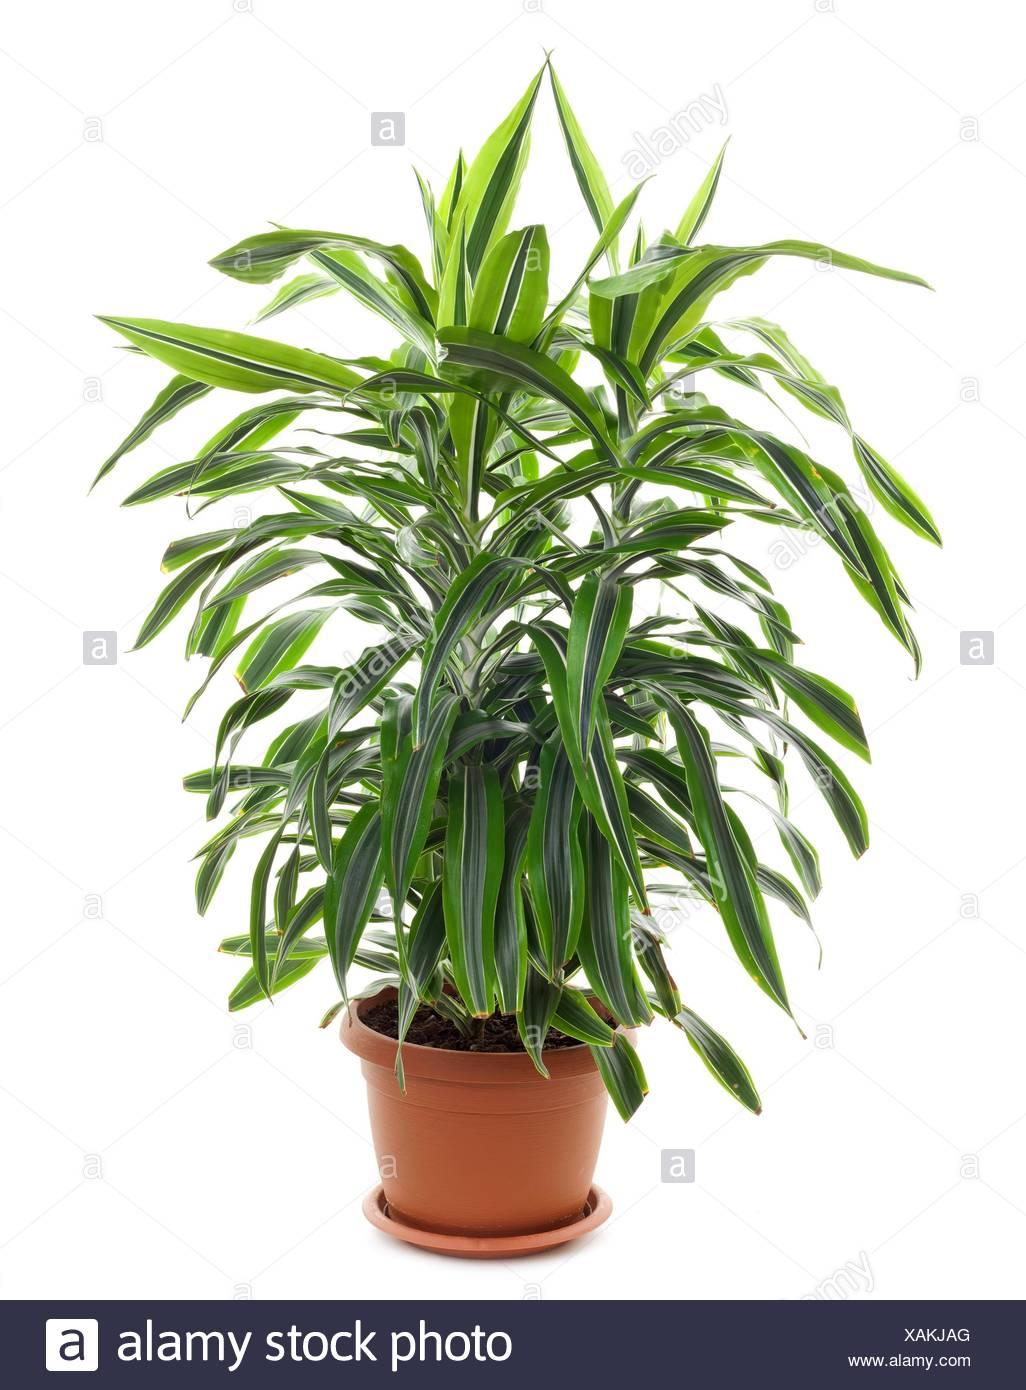 Chlorophytum evergreen perennial flowering plants in the family chlorophytum evergreen perennial flowering plants in the family asparagaceae mightylinksfo